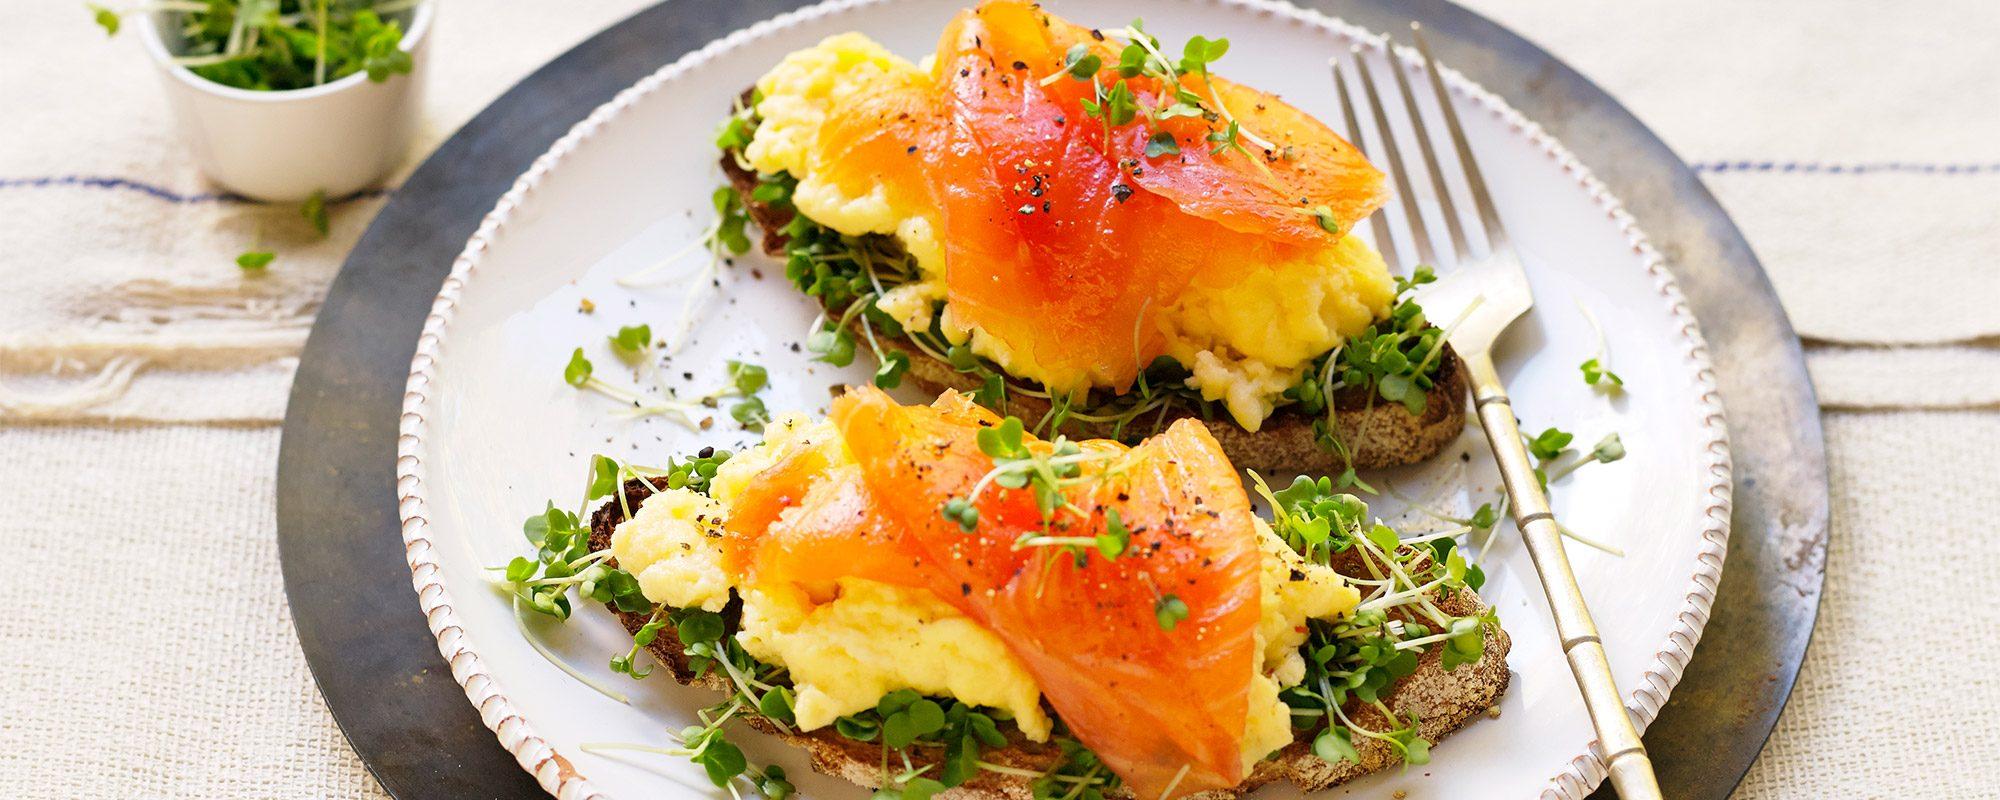 Smoked Salmon, Scrambled Egg and Salad Cress on Sourdough